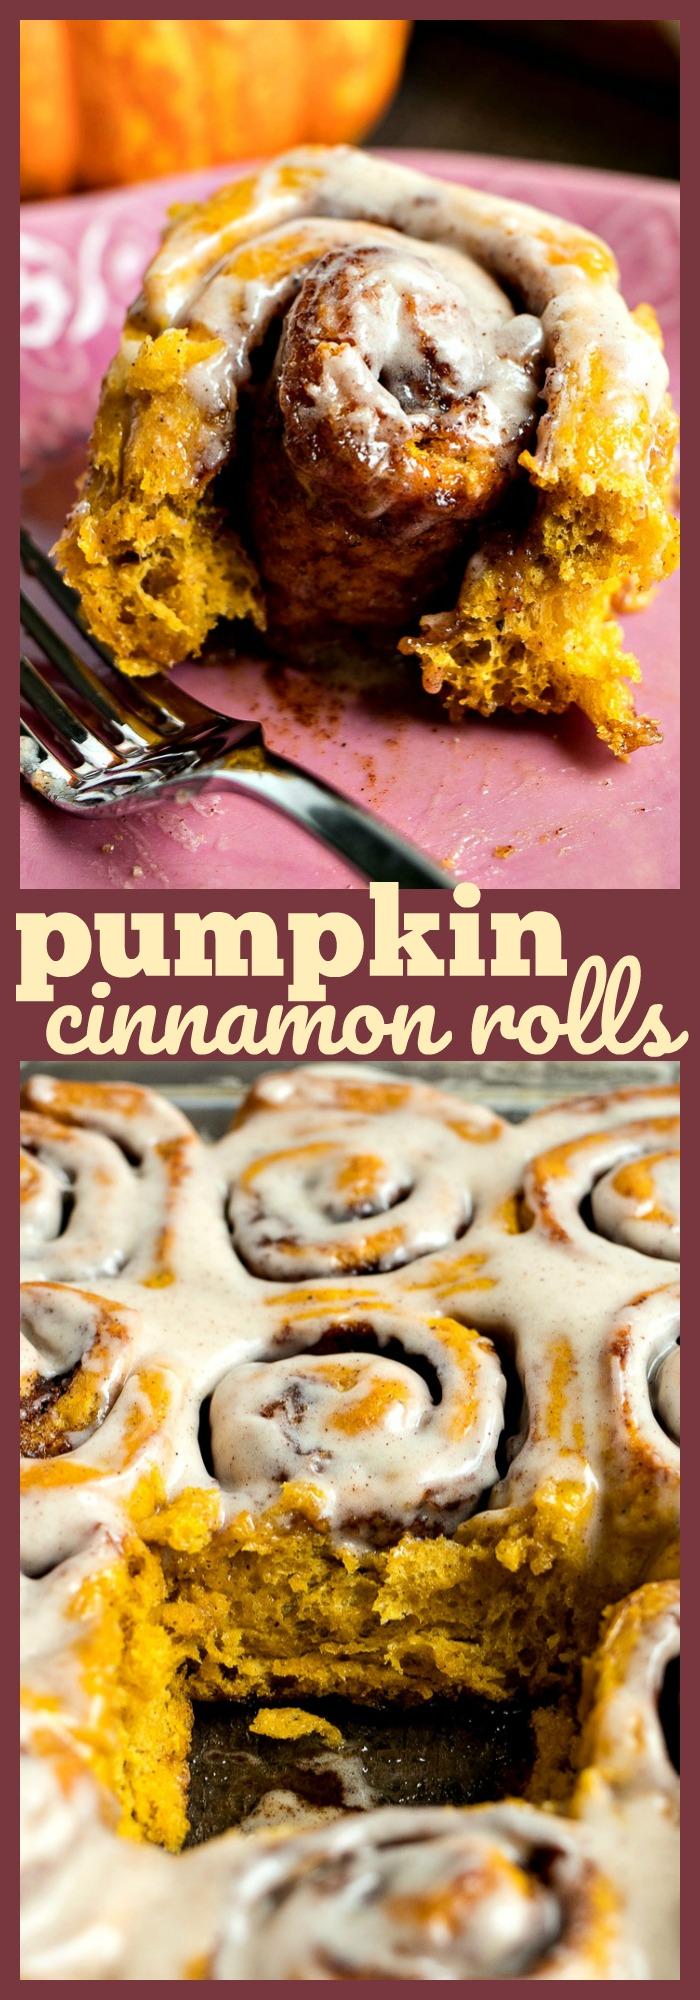 Pumpkin Cinnamon Rolls photo collage